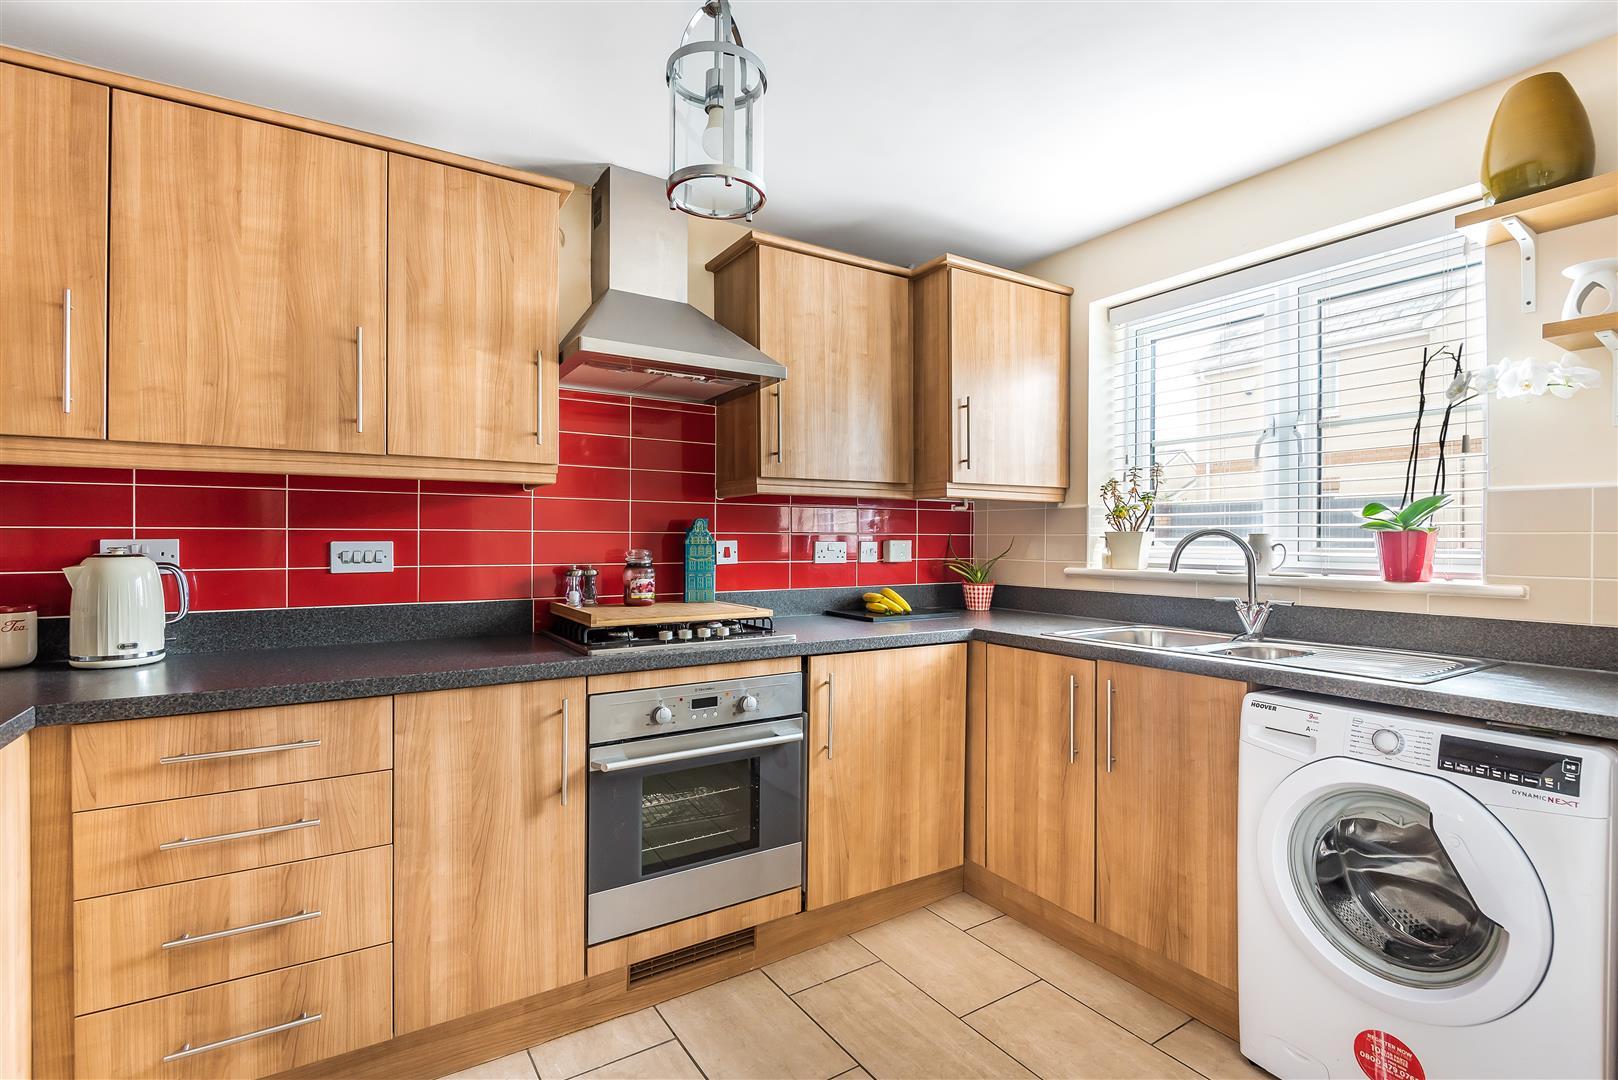 Teddington Place, Pontarddulais, Swansea, SA4 8AE